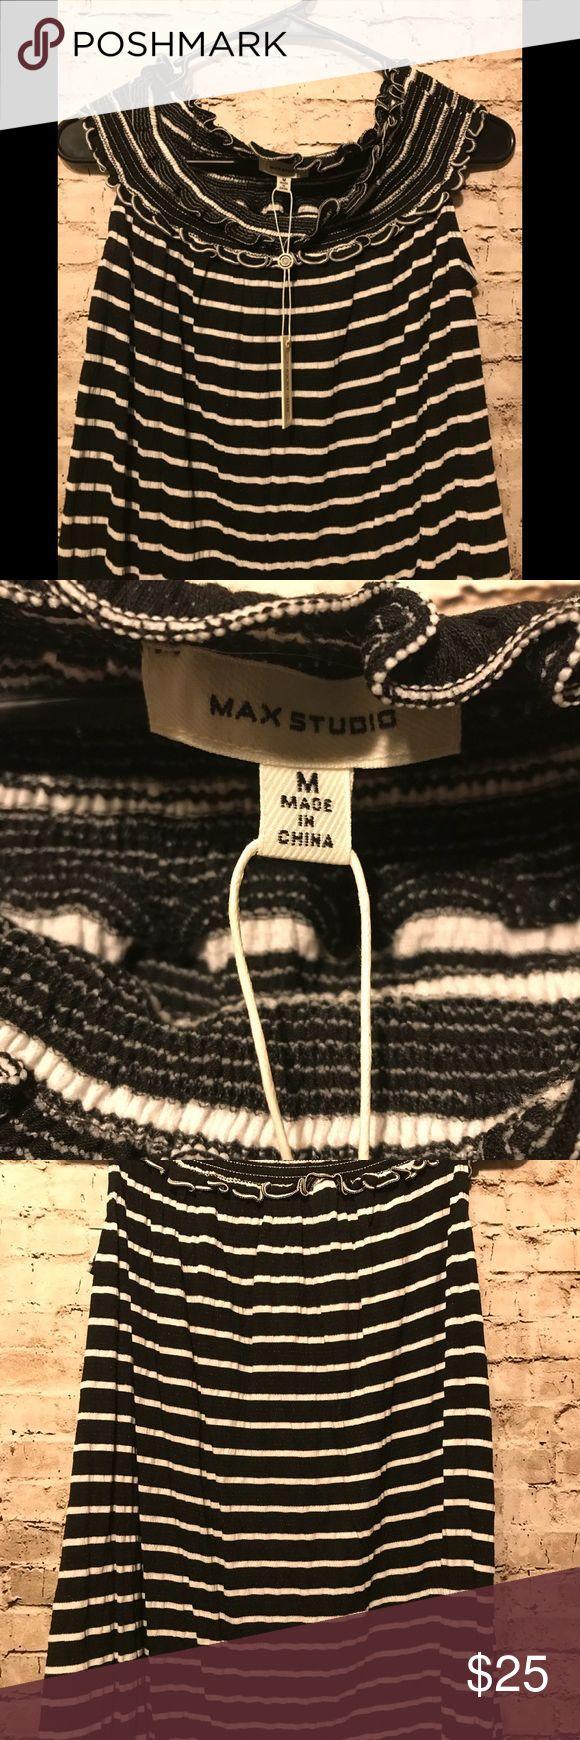 Max studio  black and white blouse size M Black and white short sleeve blouse size M Max Studio Tops Blouses